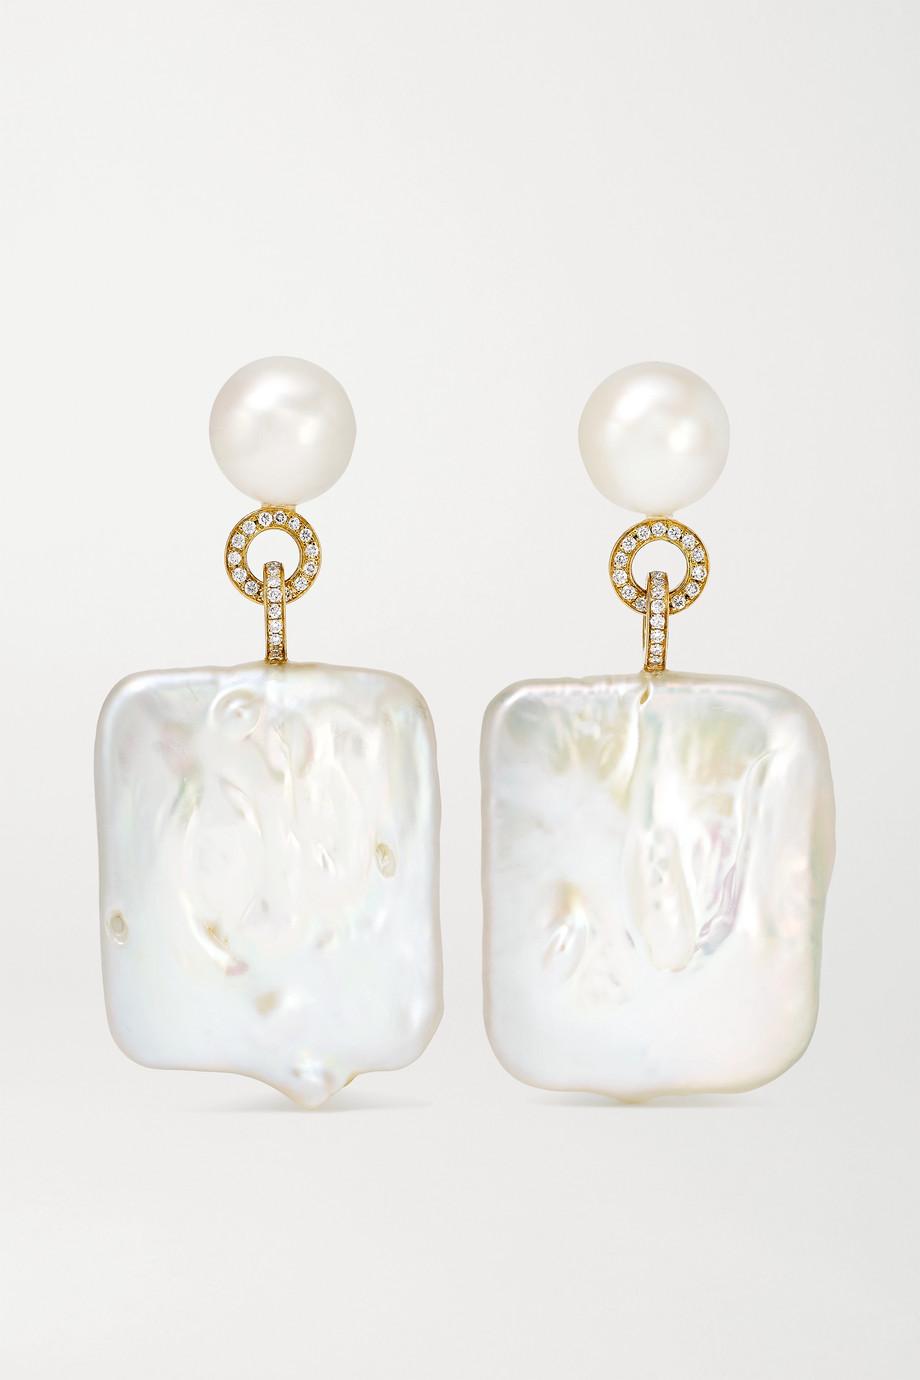 Sophie Bille Brahe Mondrian Diamant 14-karat gold, pearl and diamond earrings